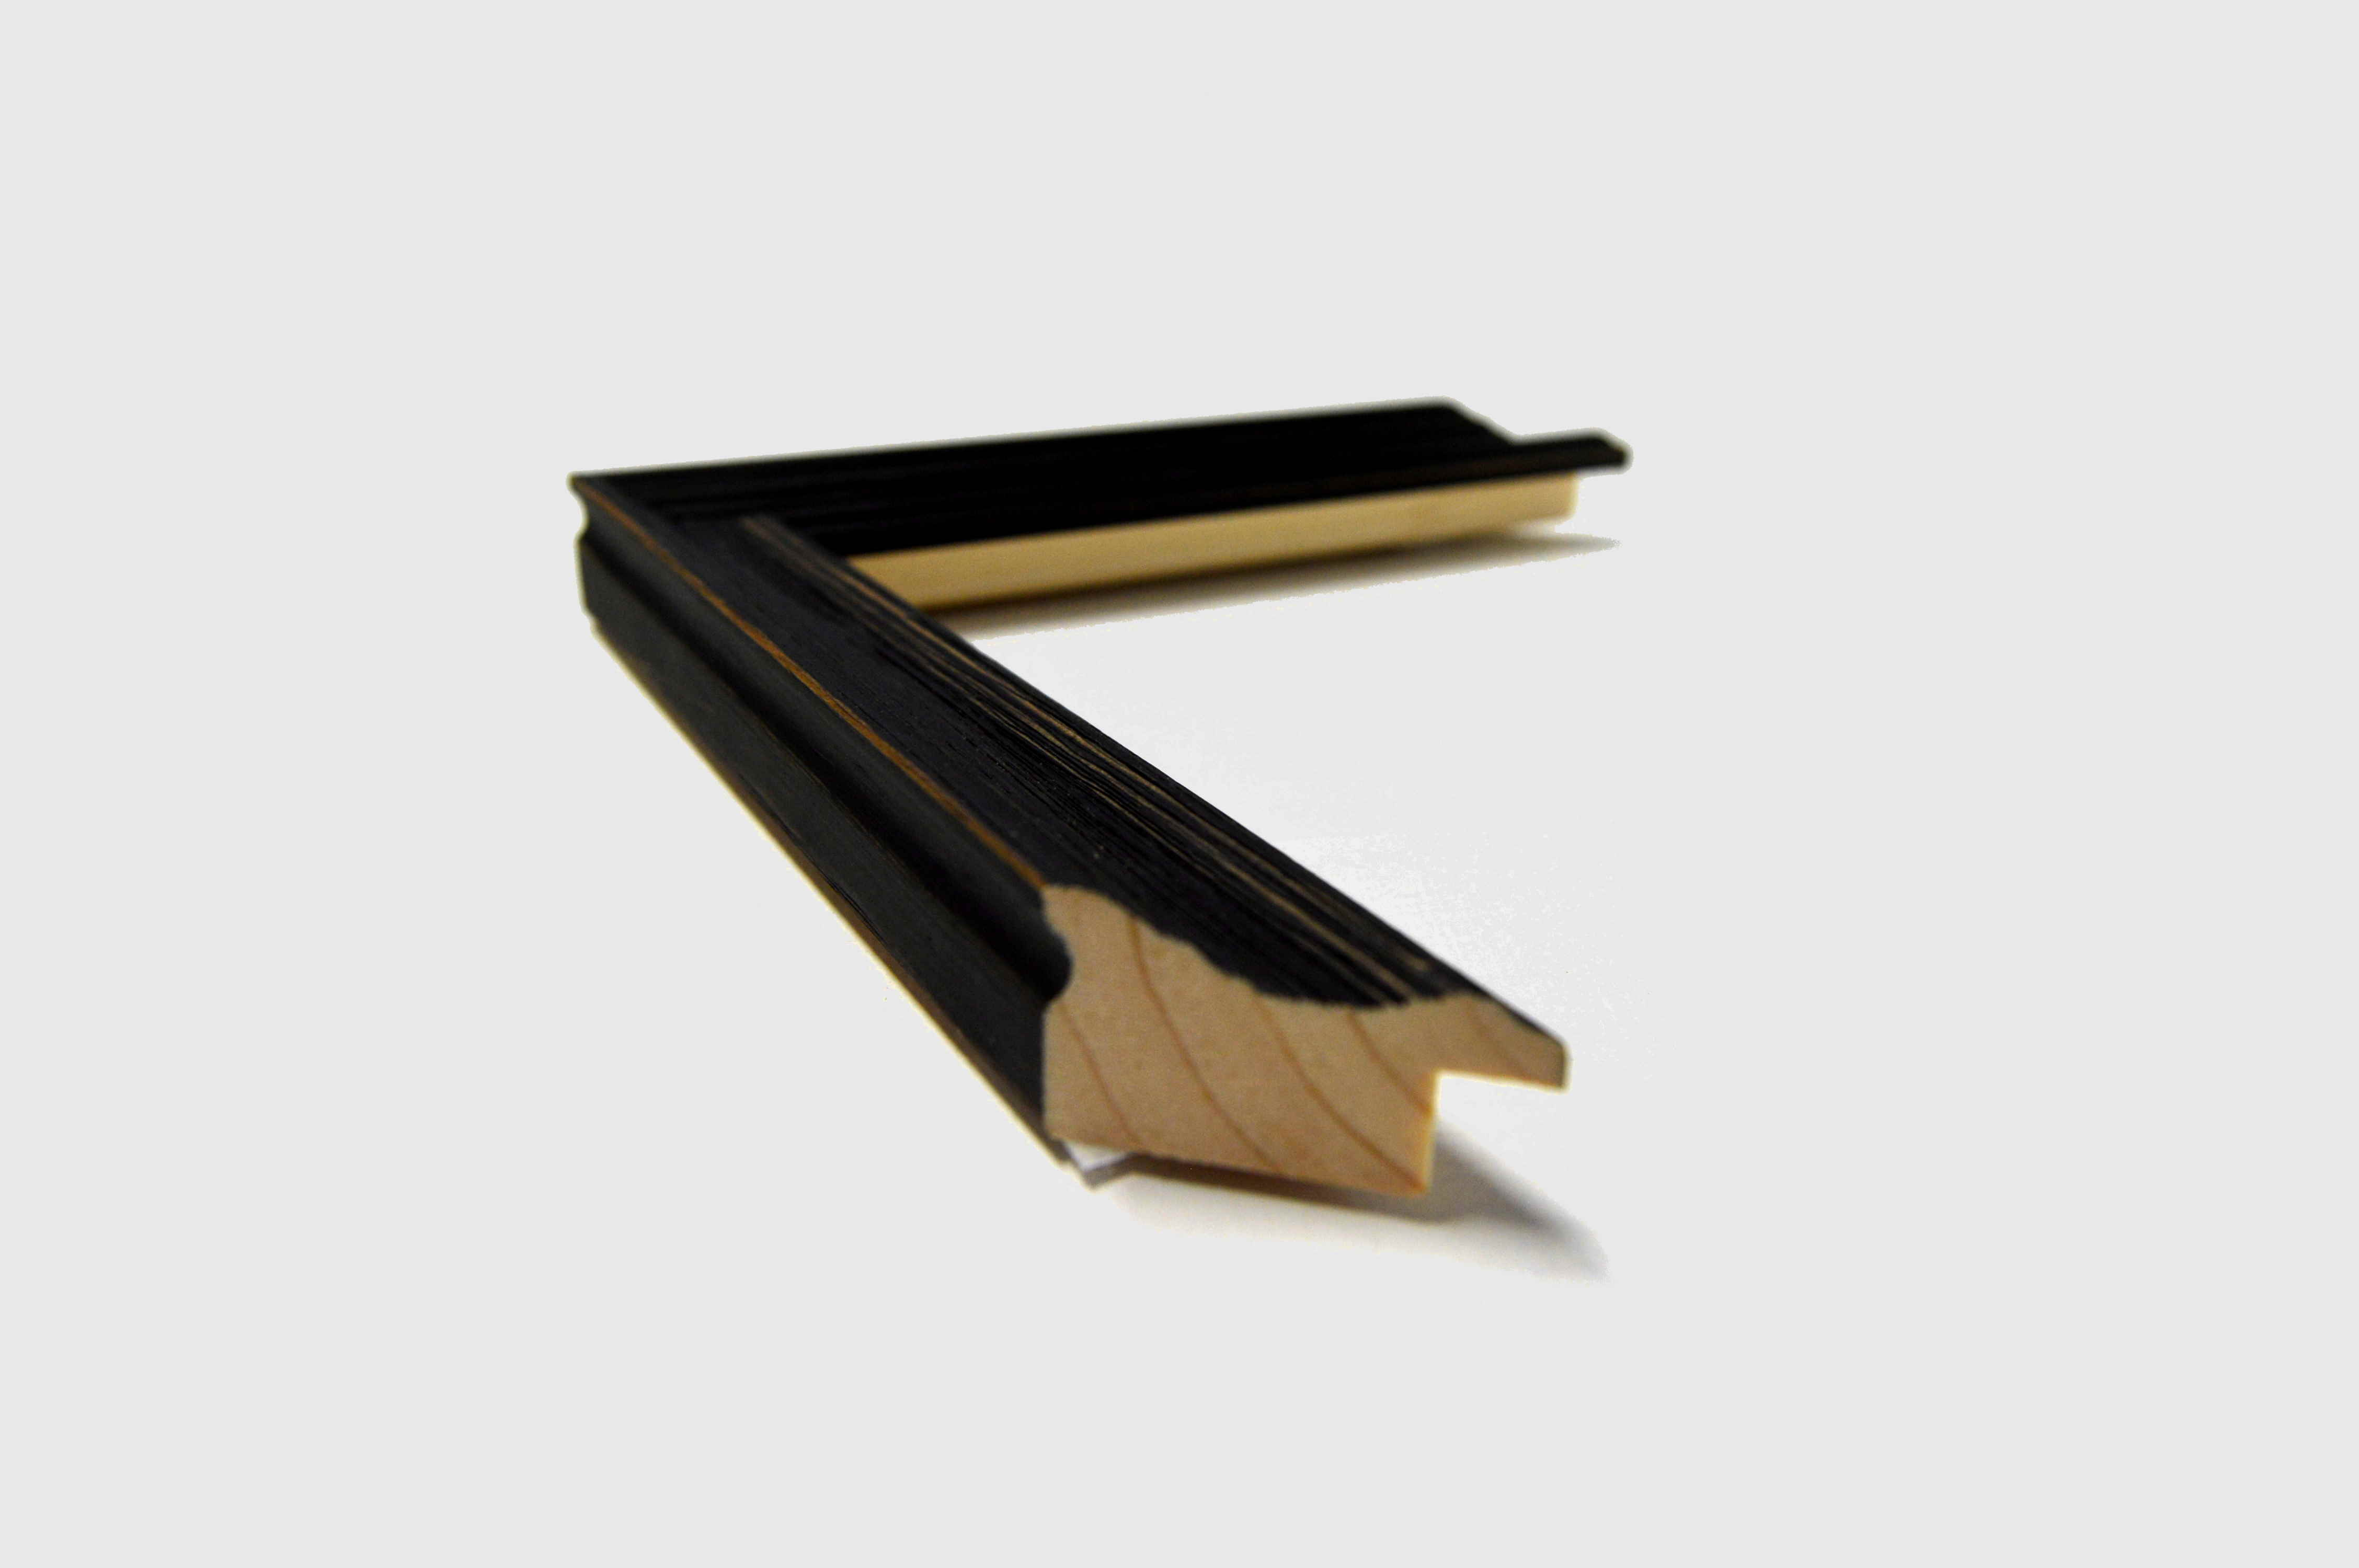 775-310-NEGRA-perfil-ancho2.7cm